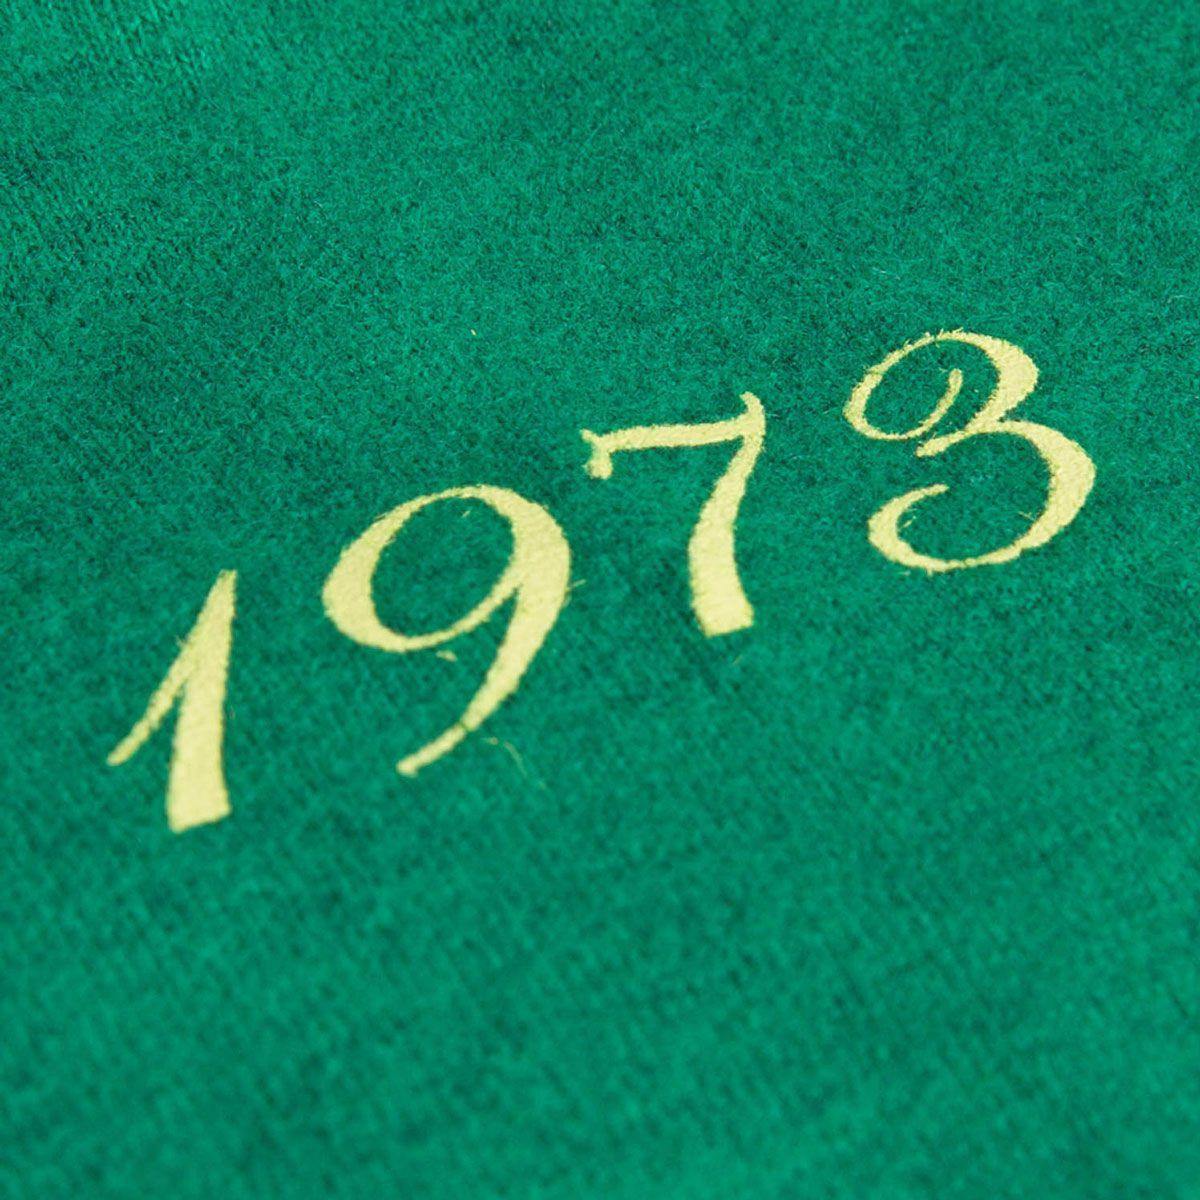 Camisa Casual Mescla Retrô Gol Chapecoense Torcedor Verde